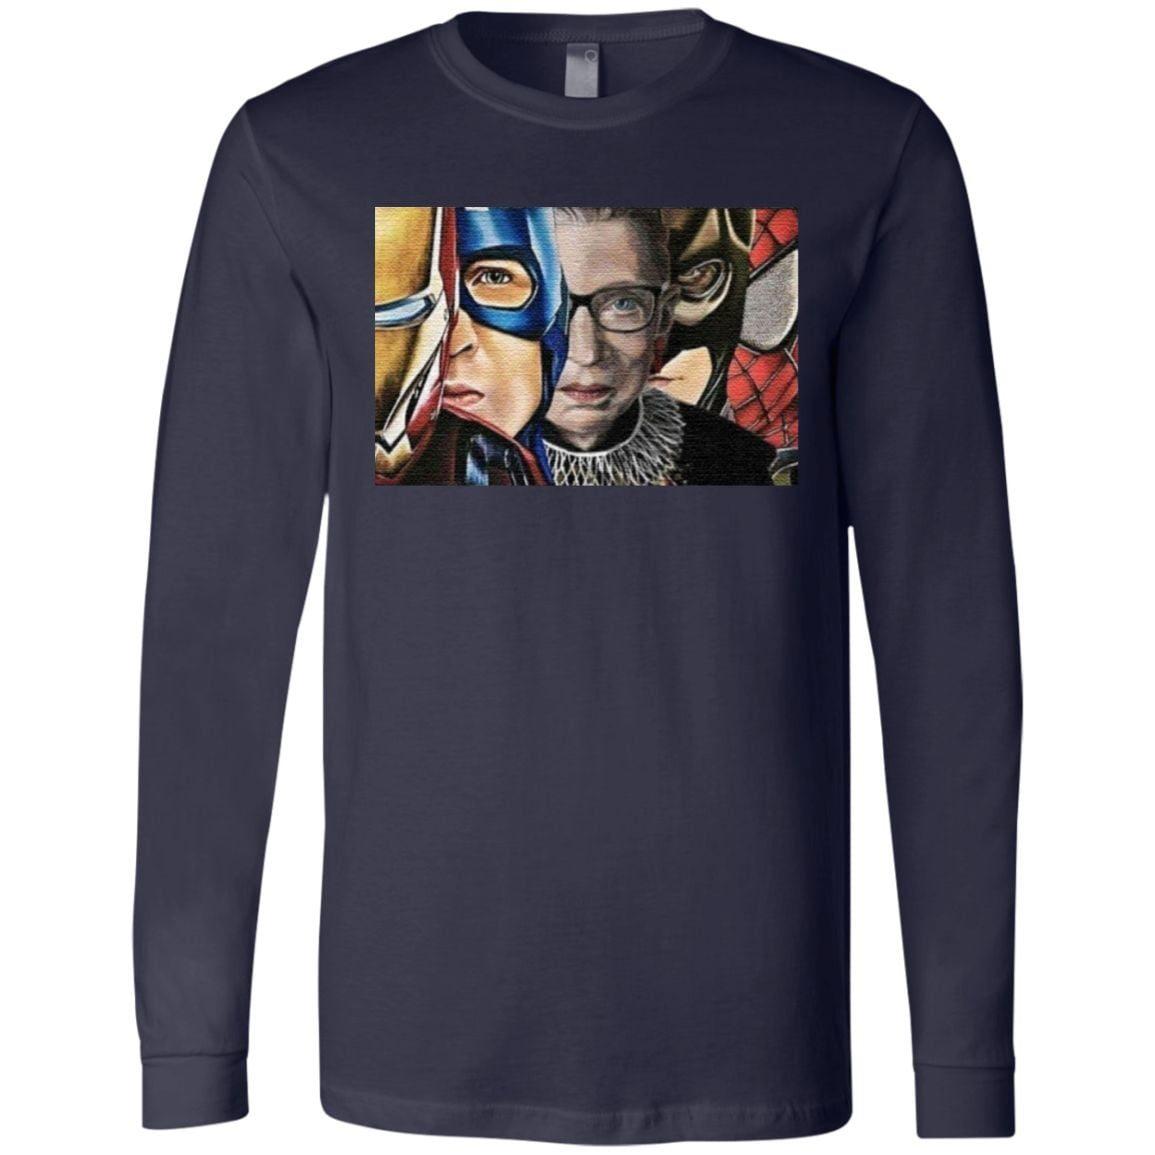 RGB Avengers T Shirt